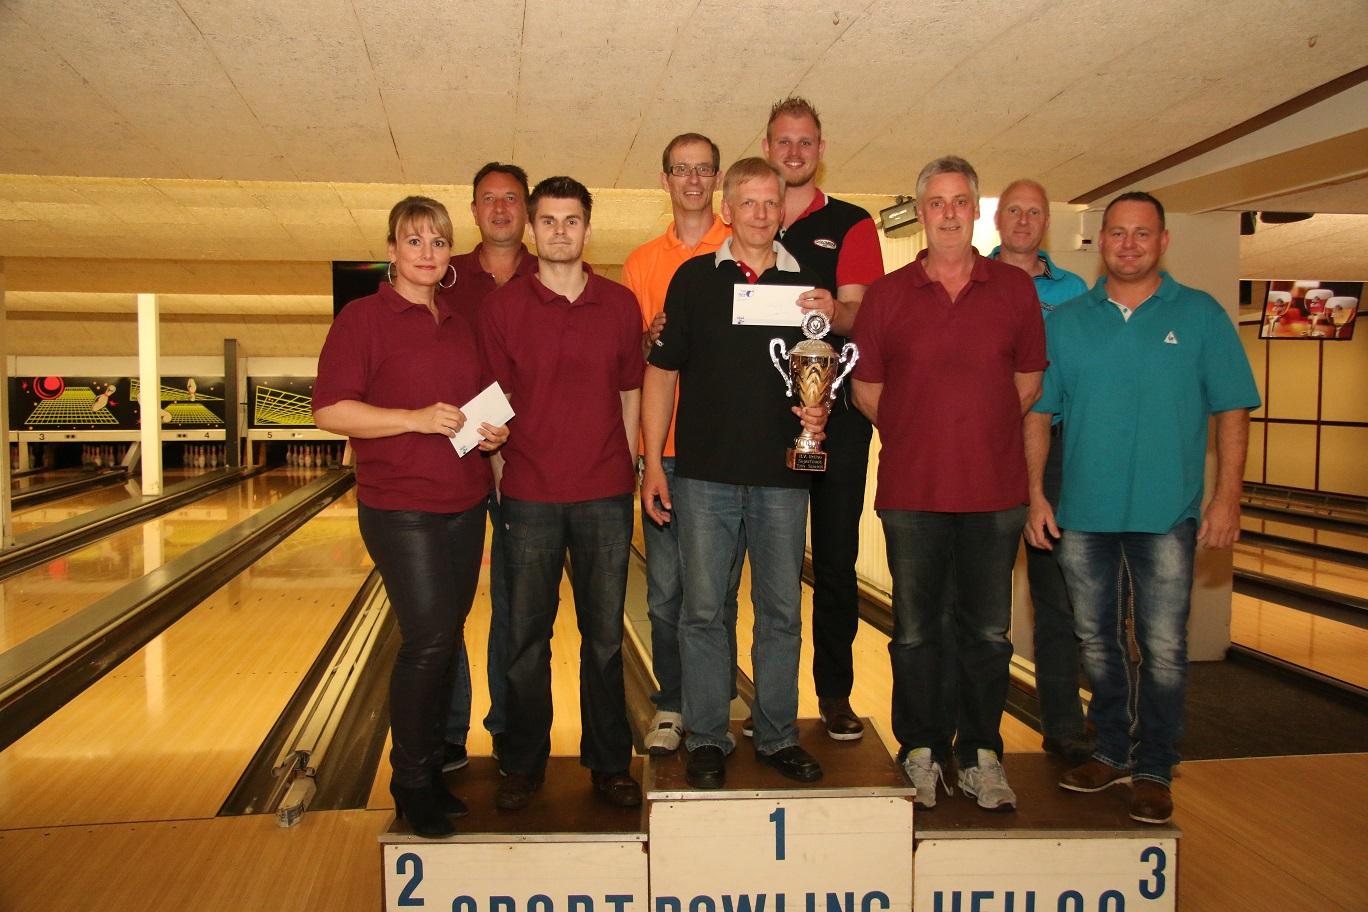 http://www.bowlingverenigingheiloo.nl/fotos_verhalen/foto's/2014_0522-SupFin-Scratch.jpg